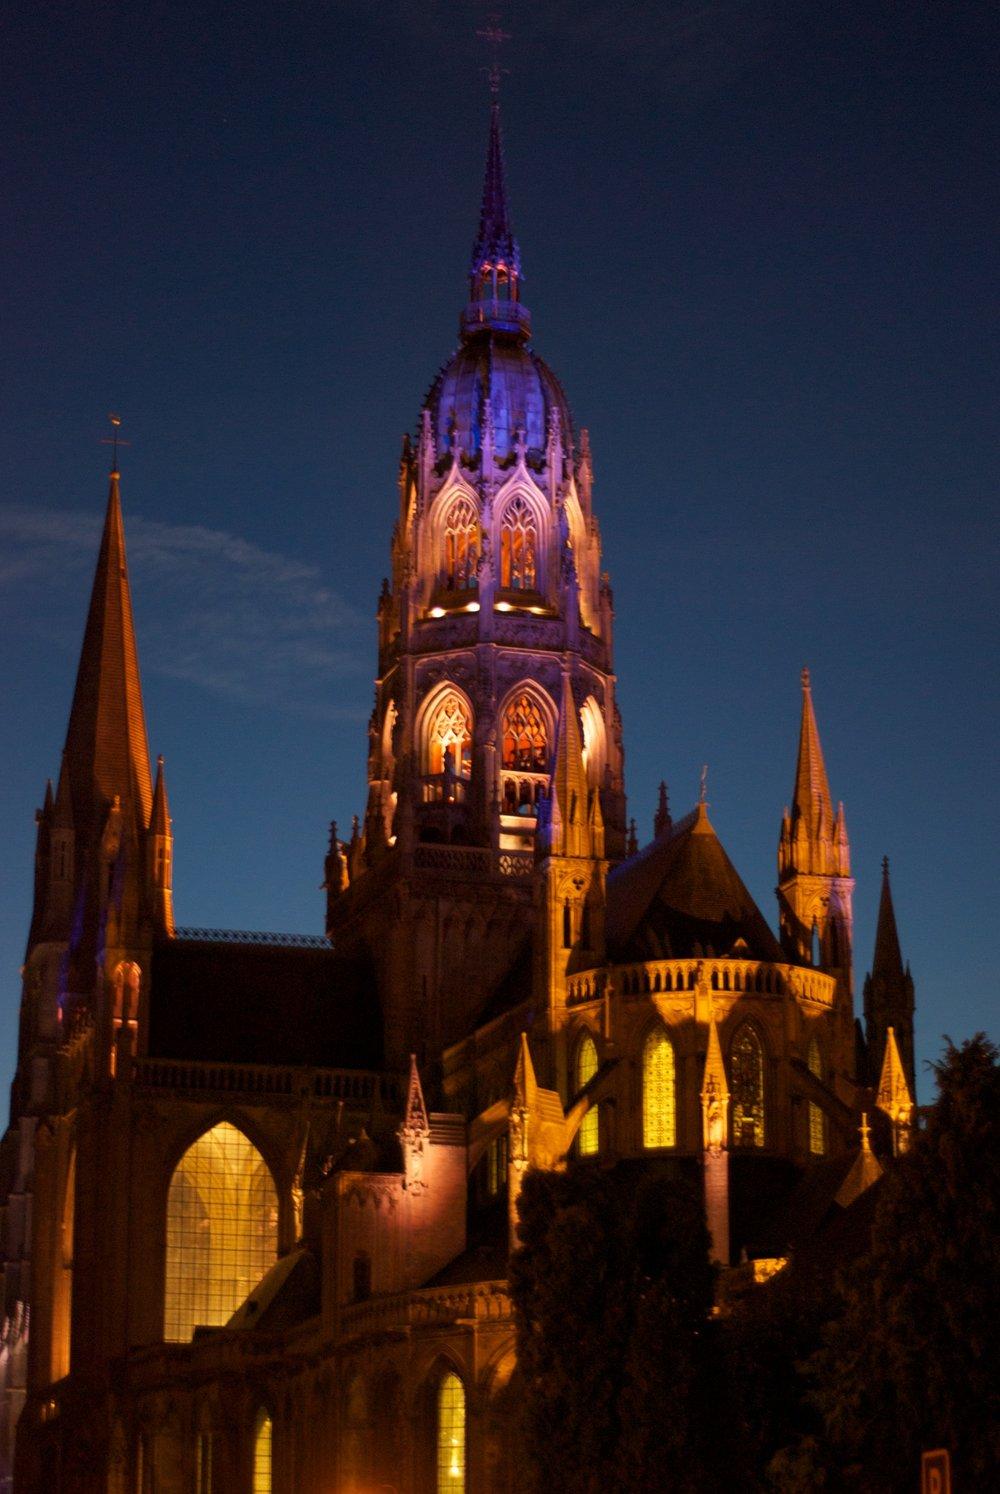 Catedral de Bayeux de noche